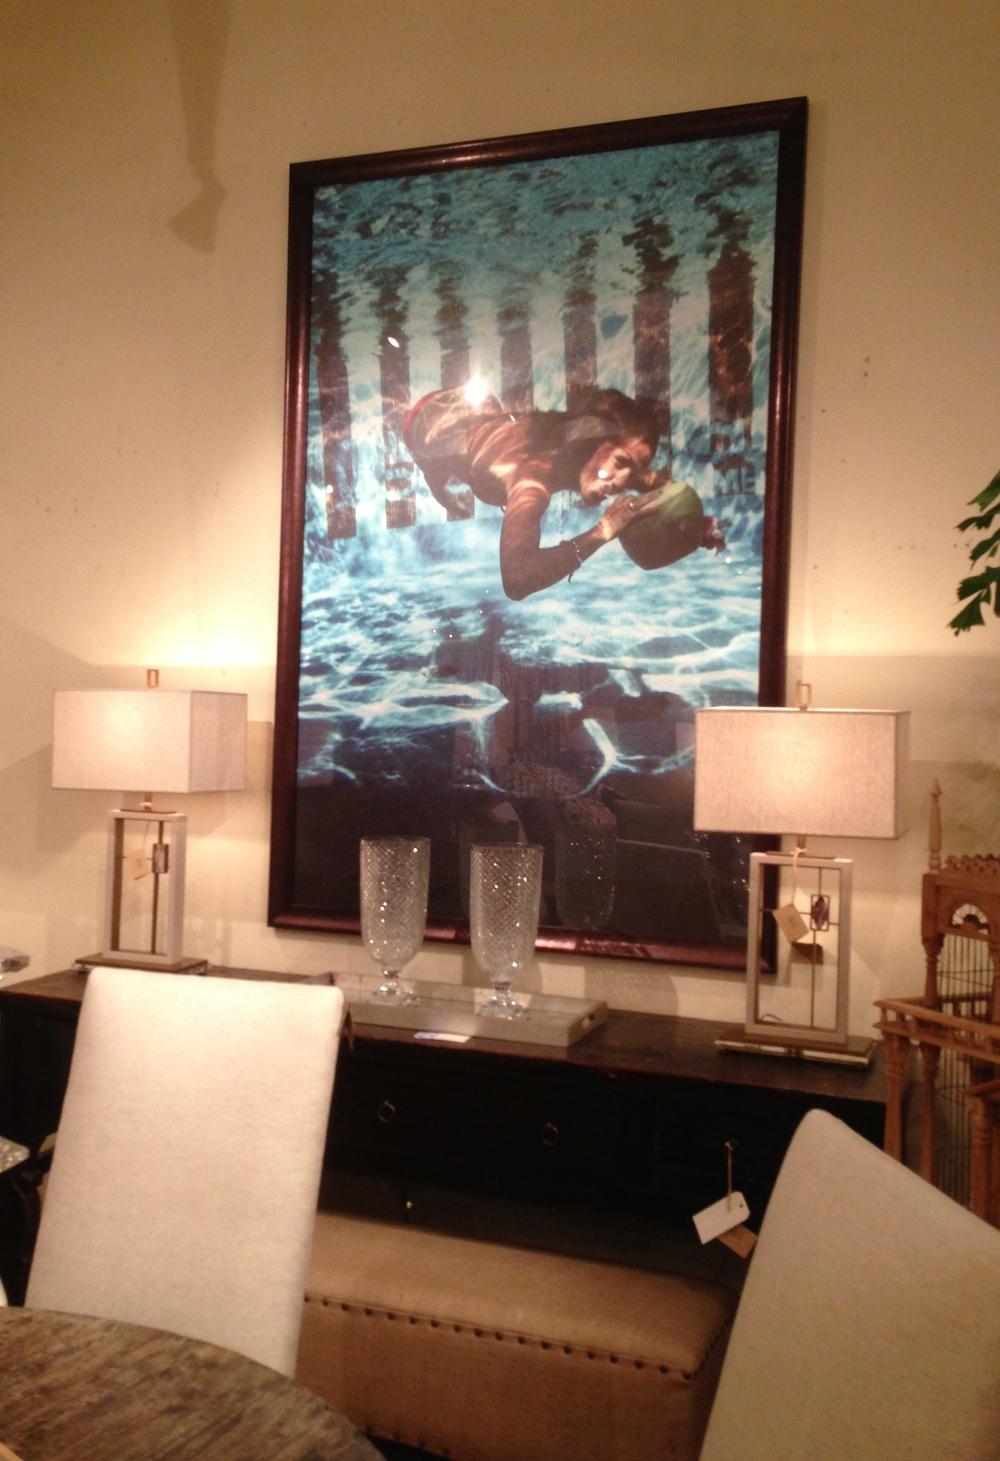 Photograph / photography / photo as art in interior design